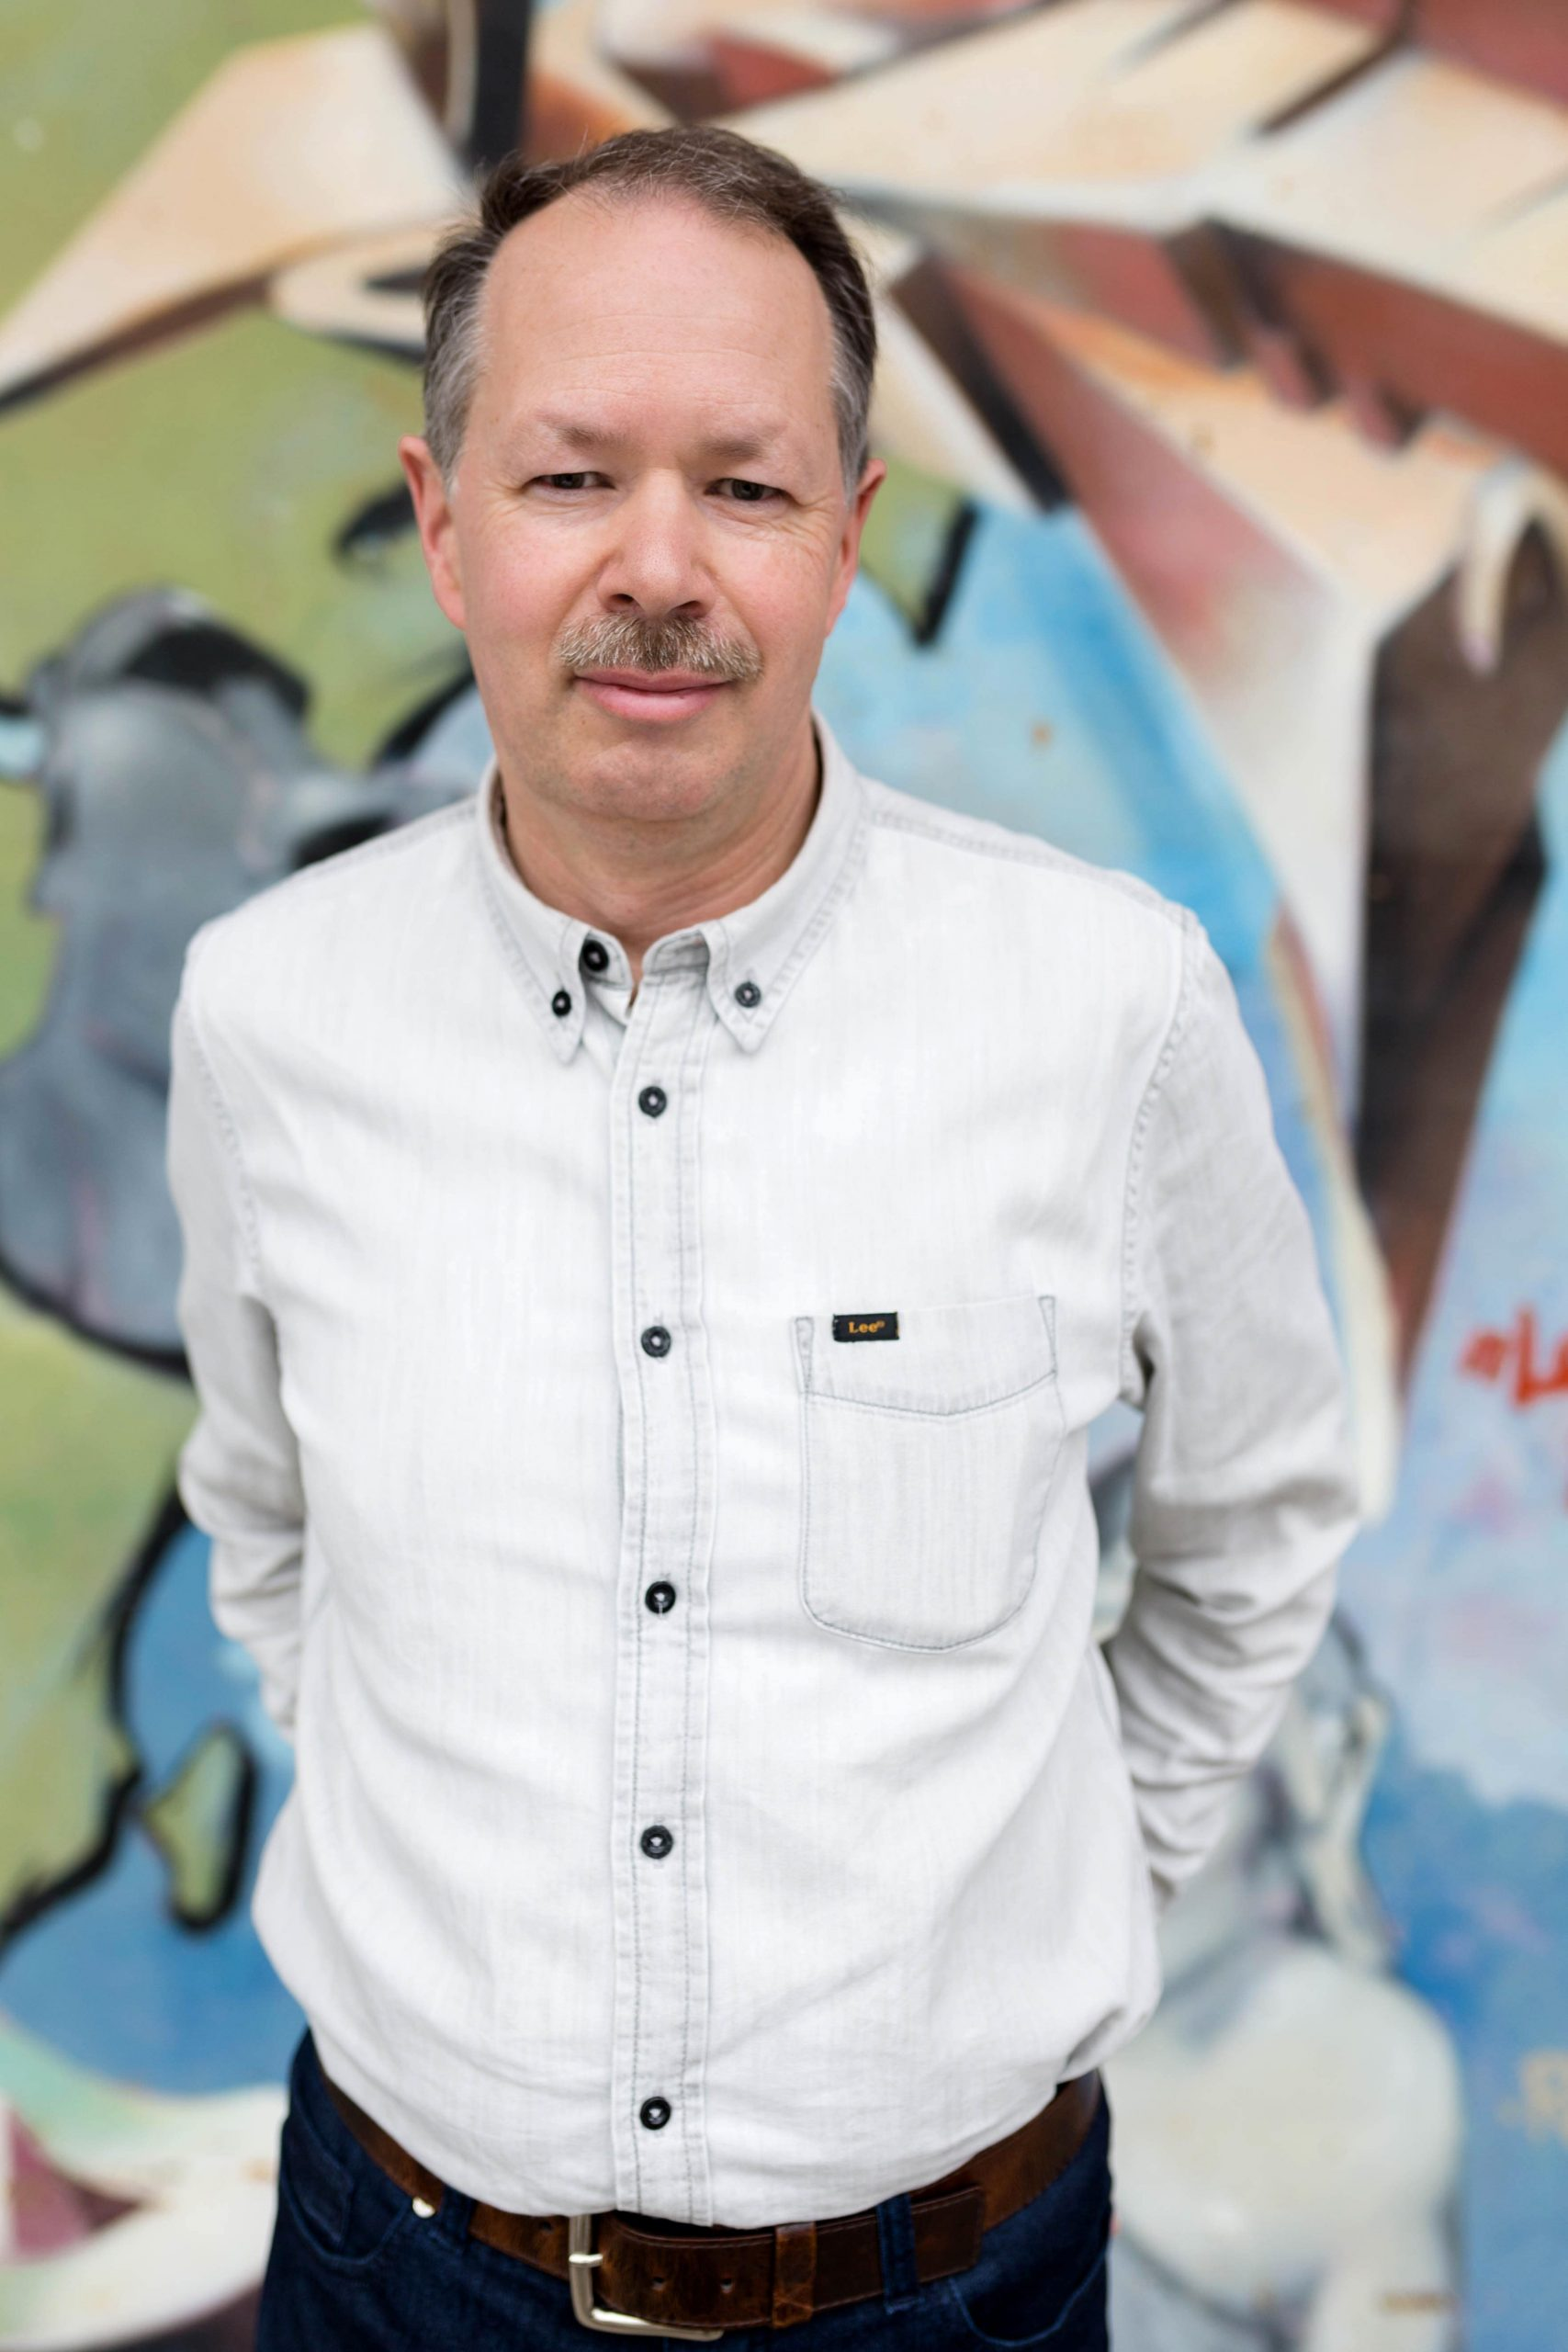 Robert Bild